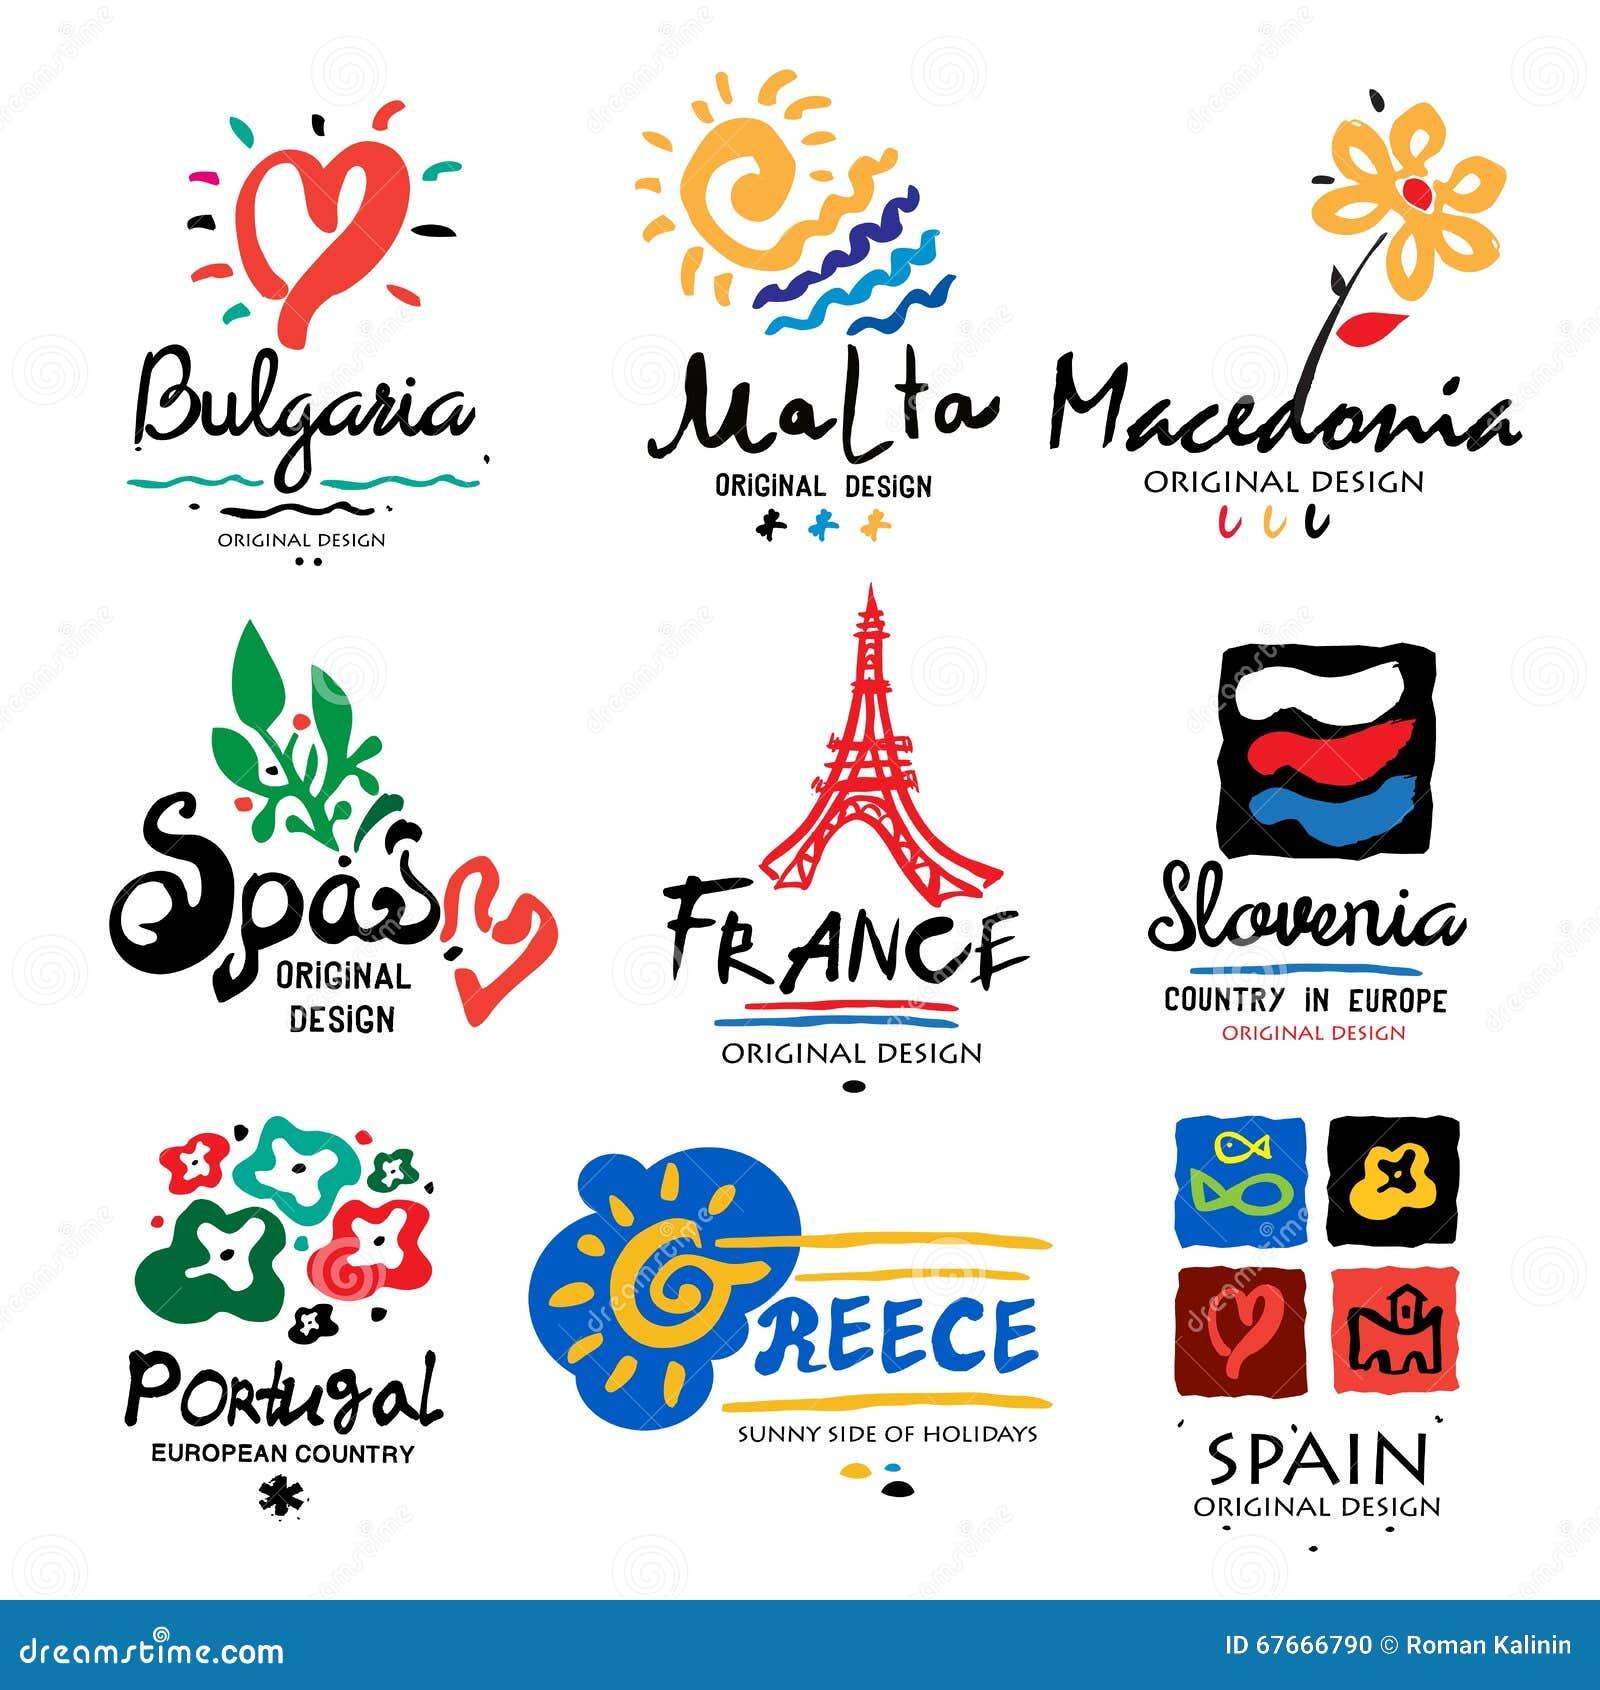 Europa Travel Agency